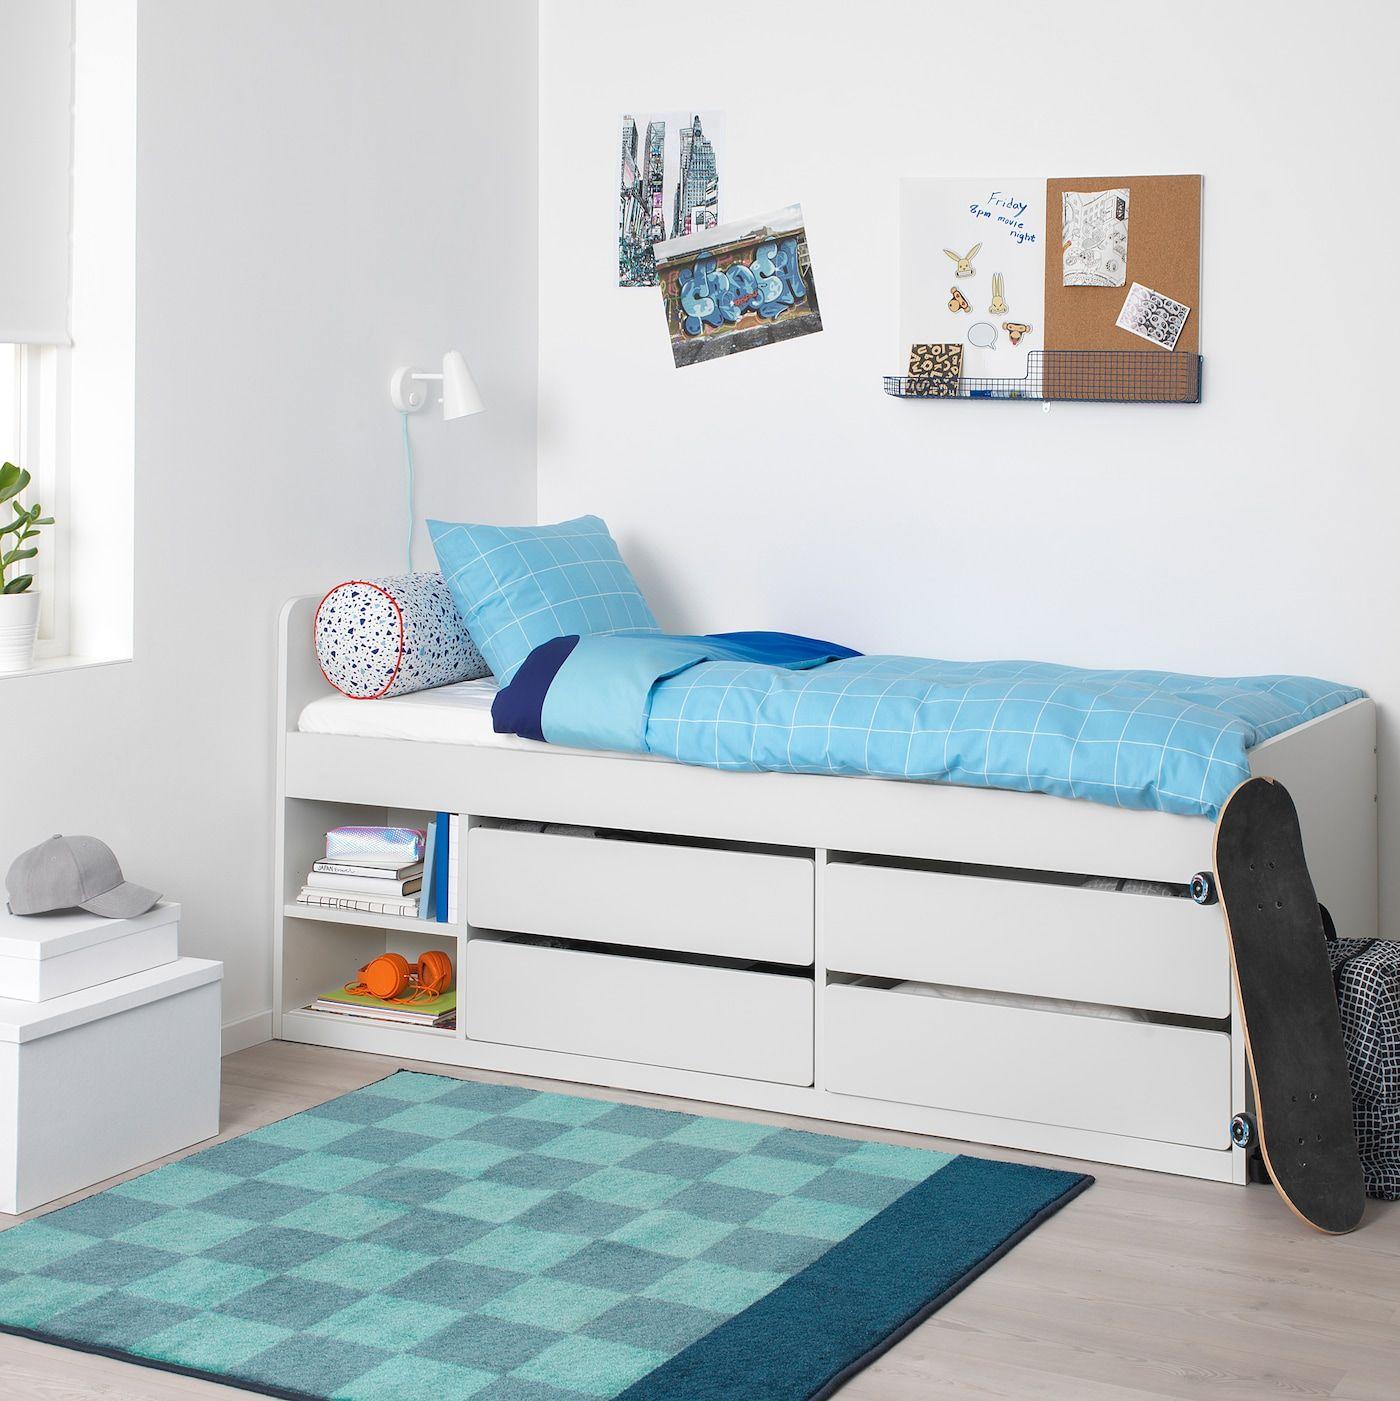 Slakt Bed Frame W Storage Slatted Bedbase White Twin White Bed